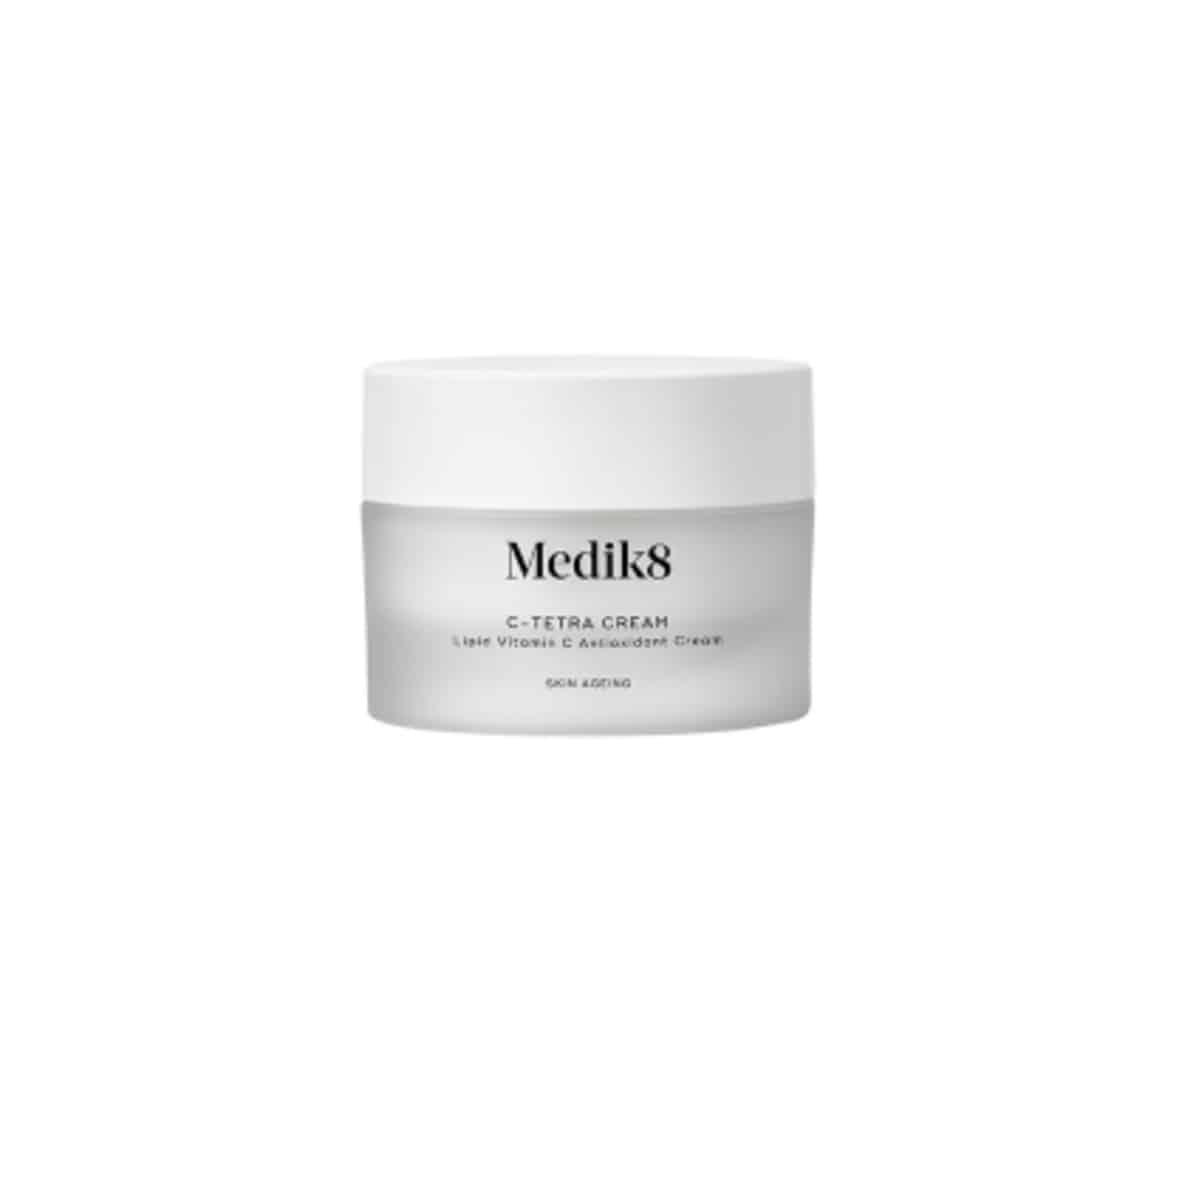 Medik8 C-Tetra Cream Ireland